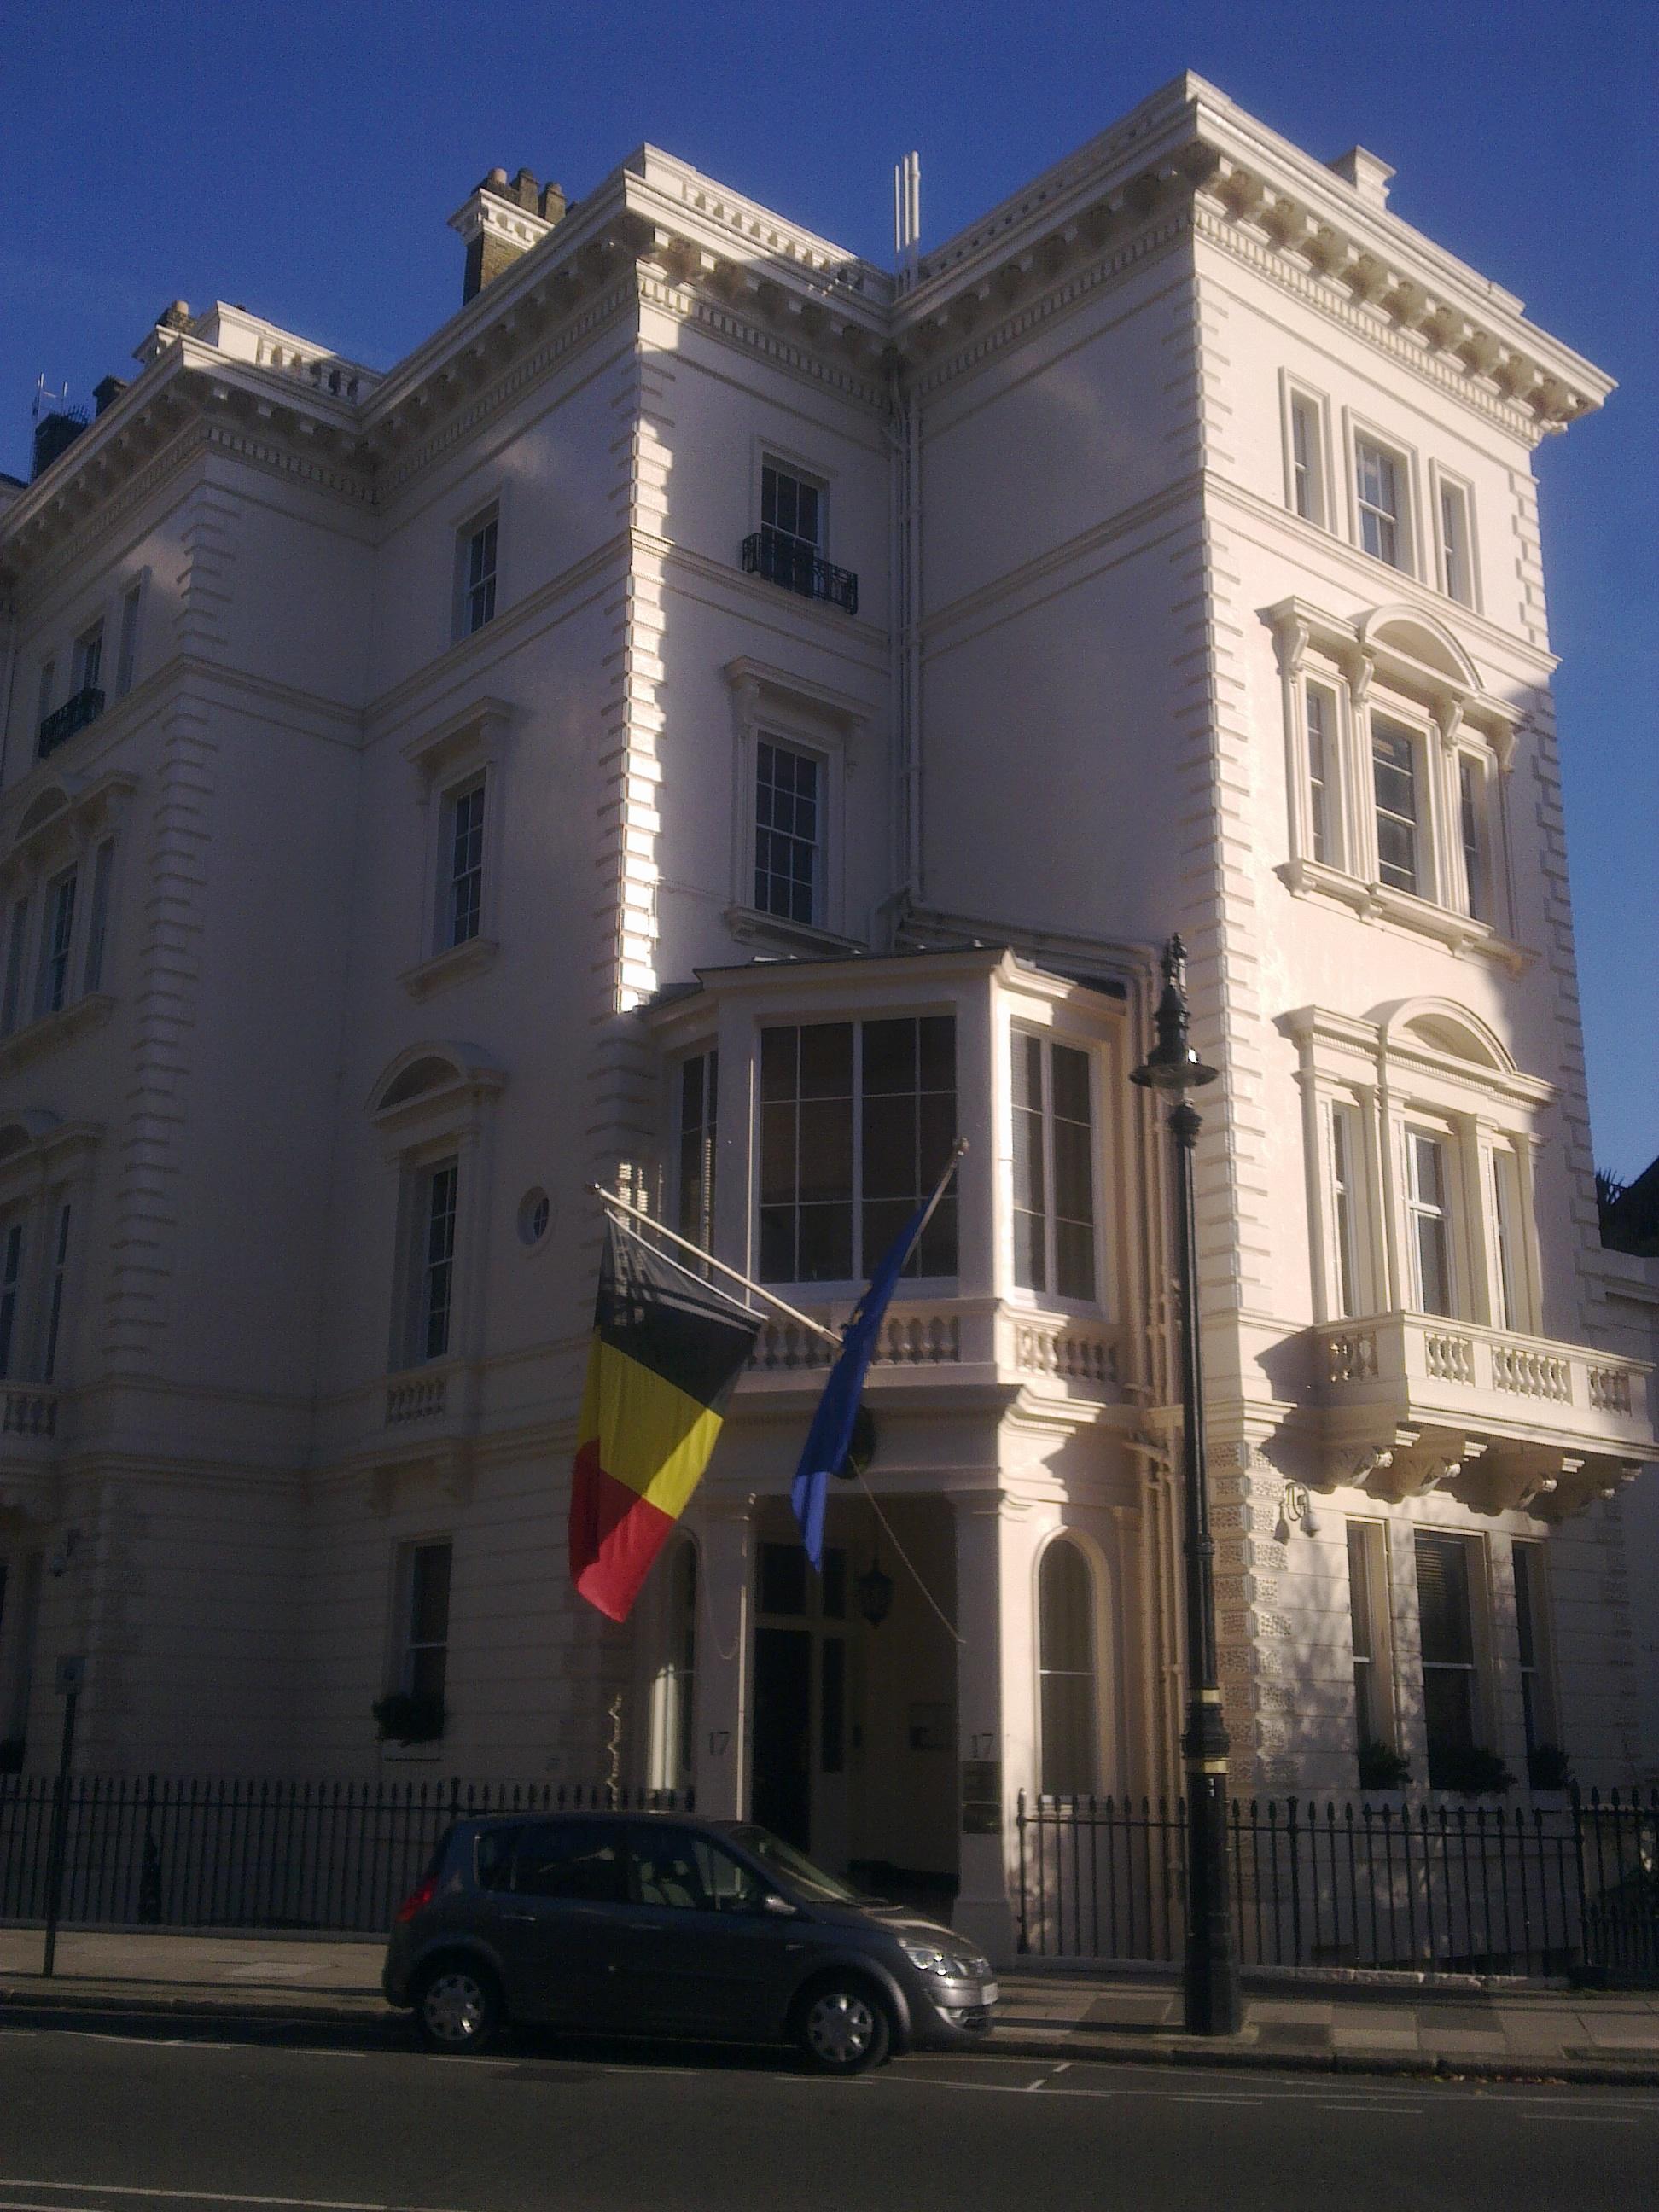 Fileembassy Of Belgium In London  Jpg